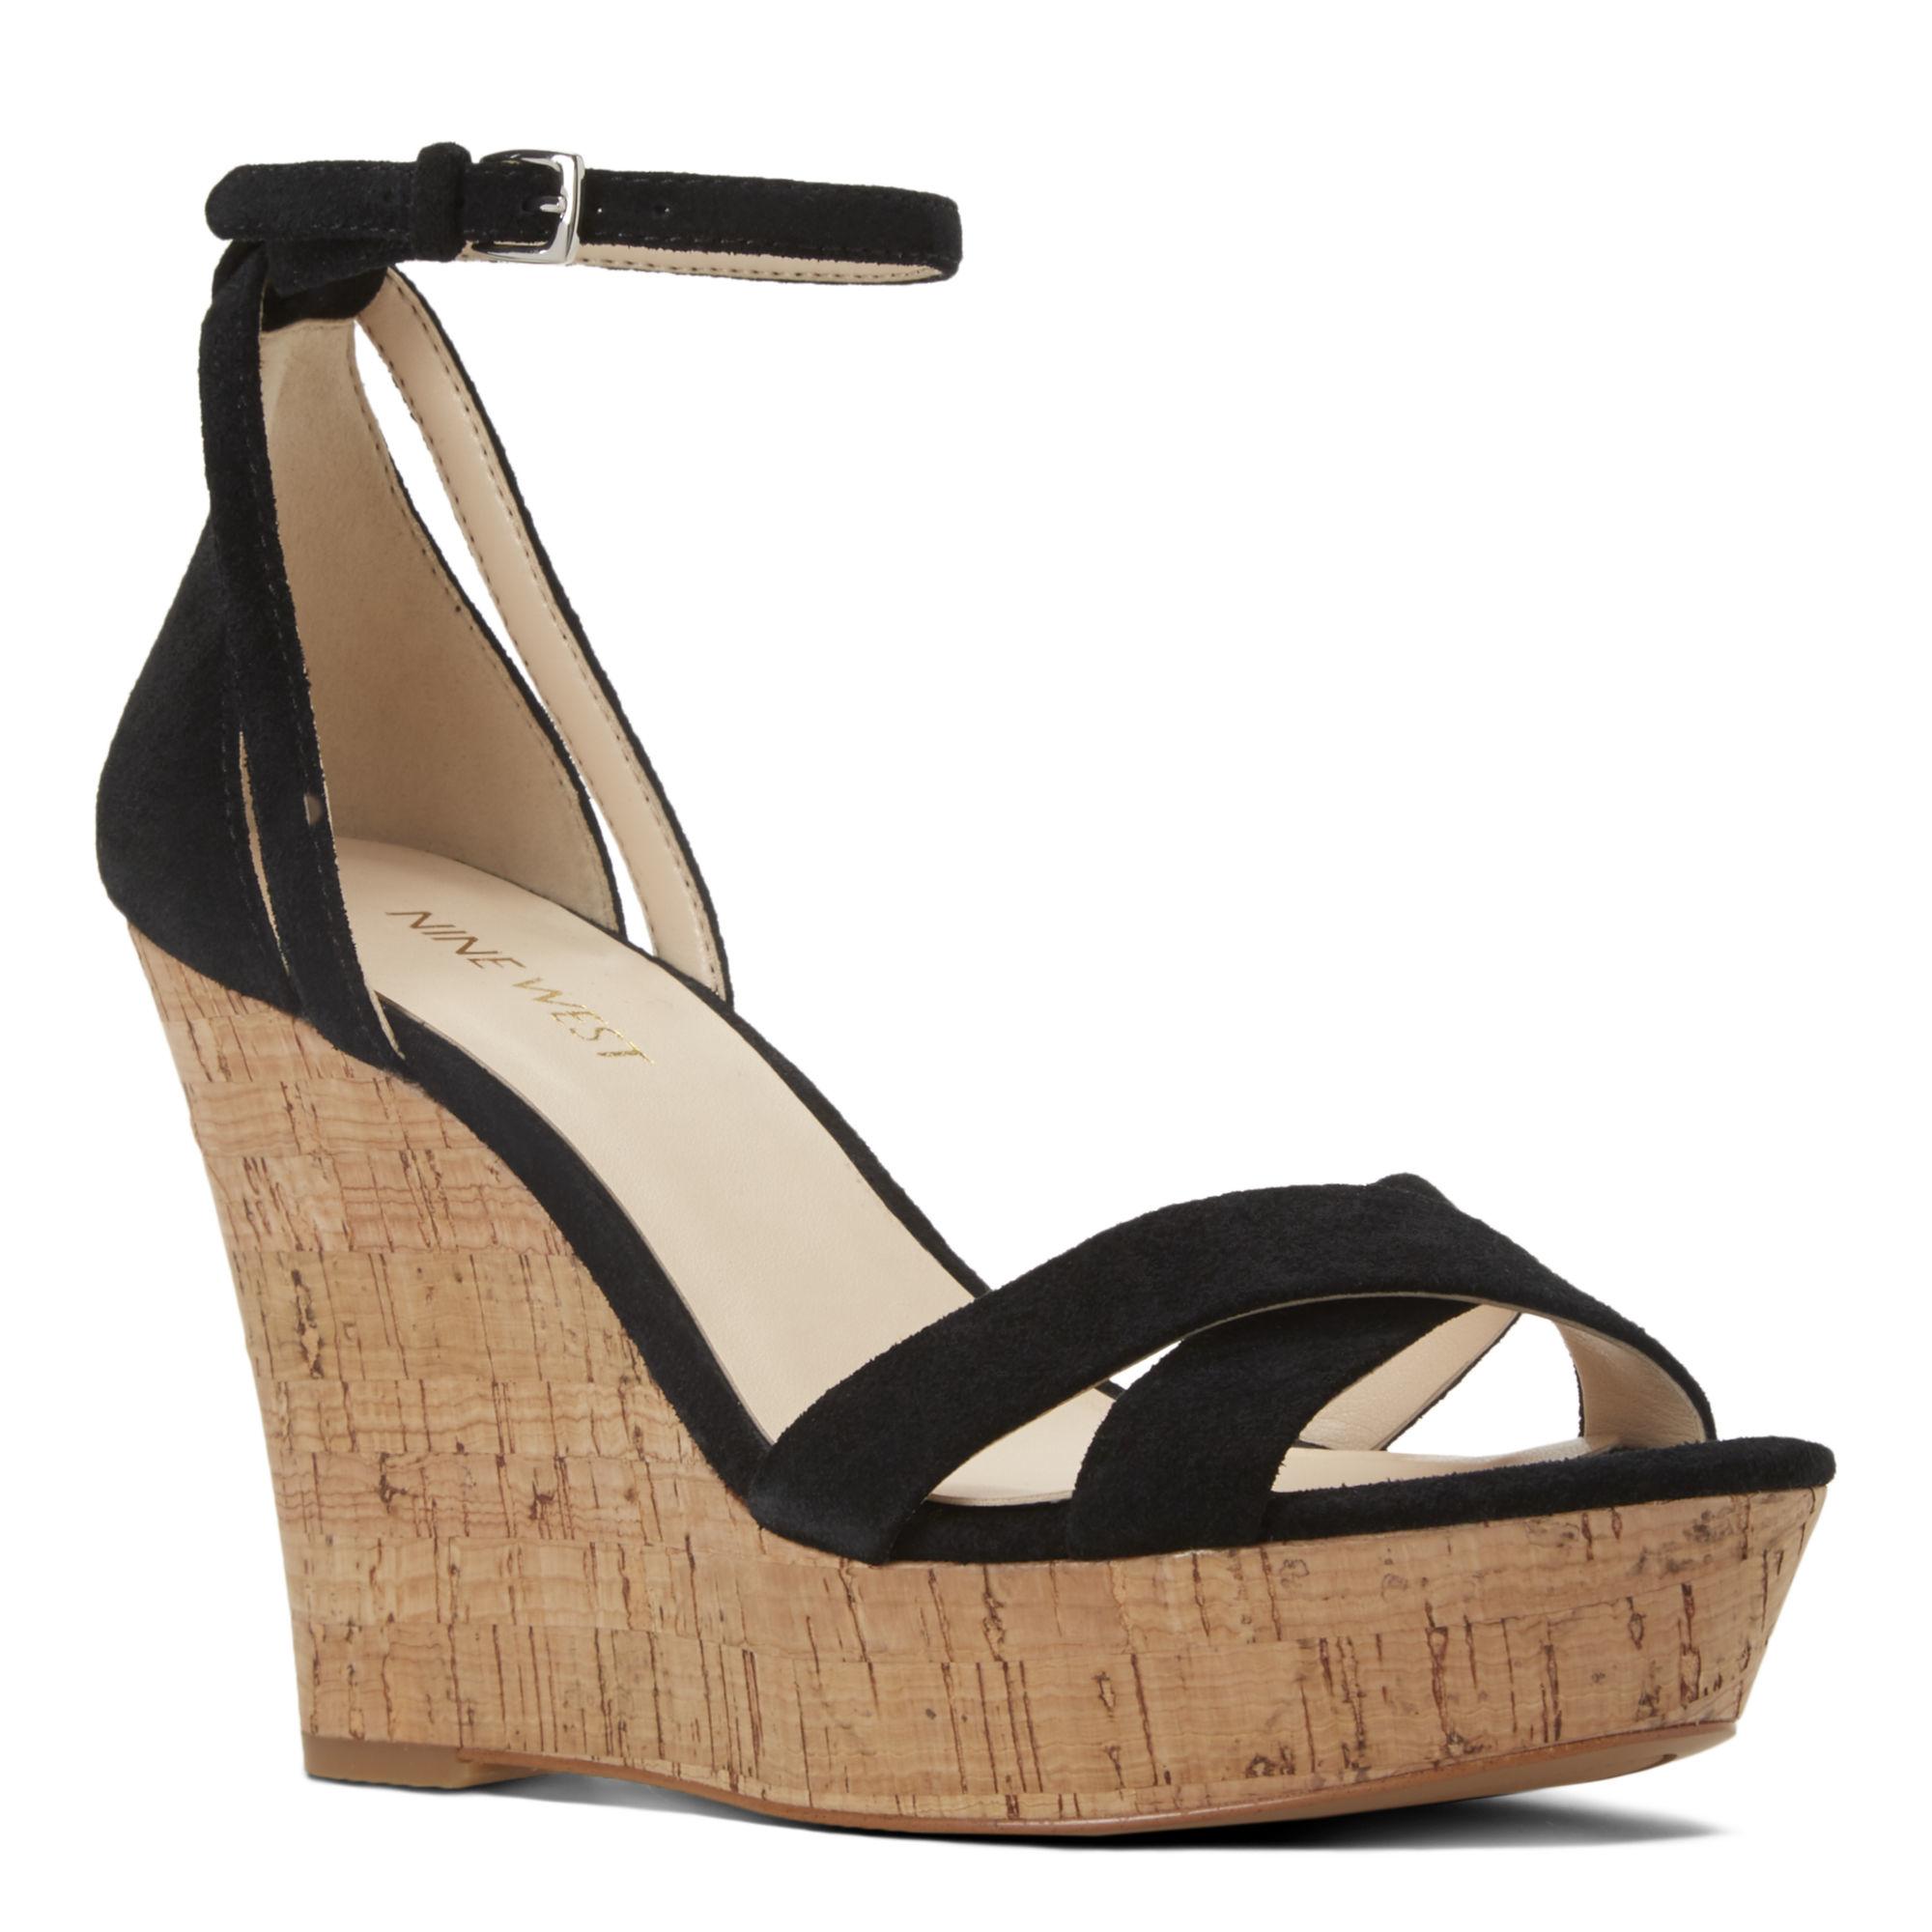 dbddbb448b72 Gallery. Women s Malone Souliers Maureen Women s Mary Jane Shoes ...